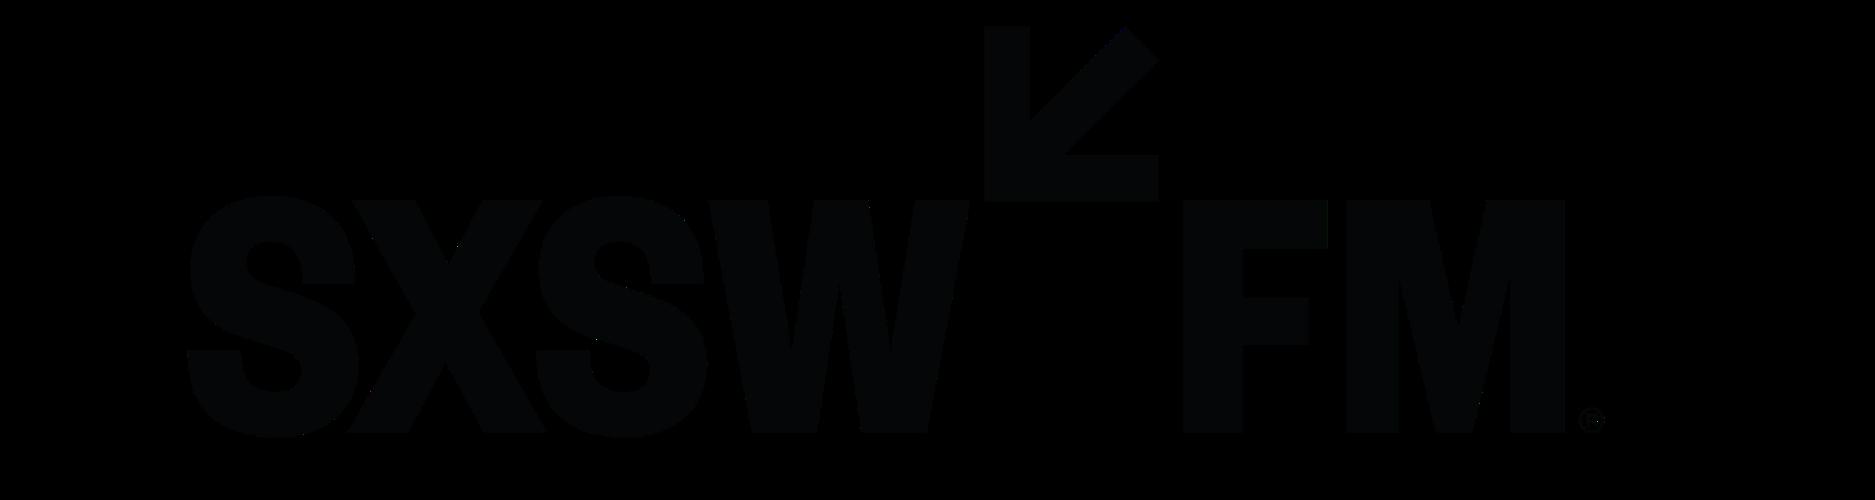 SXSW FM